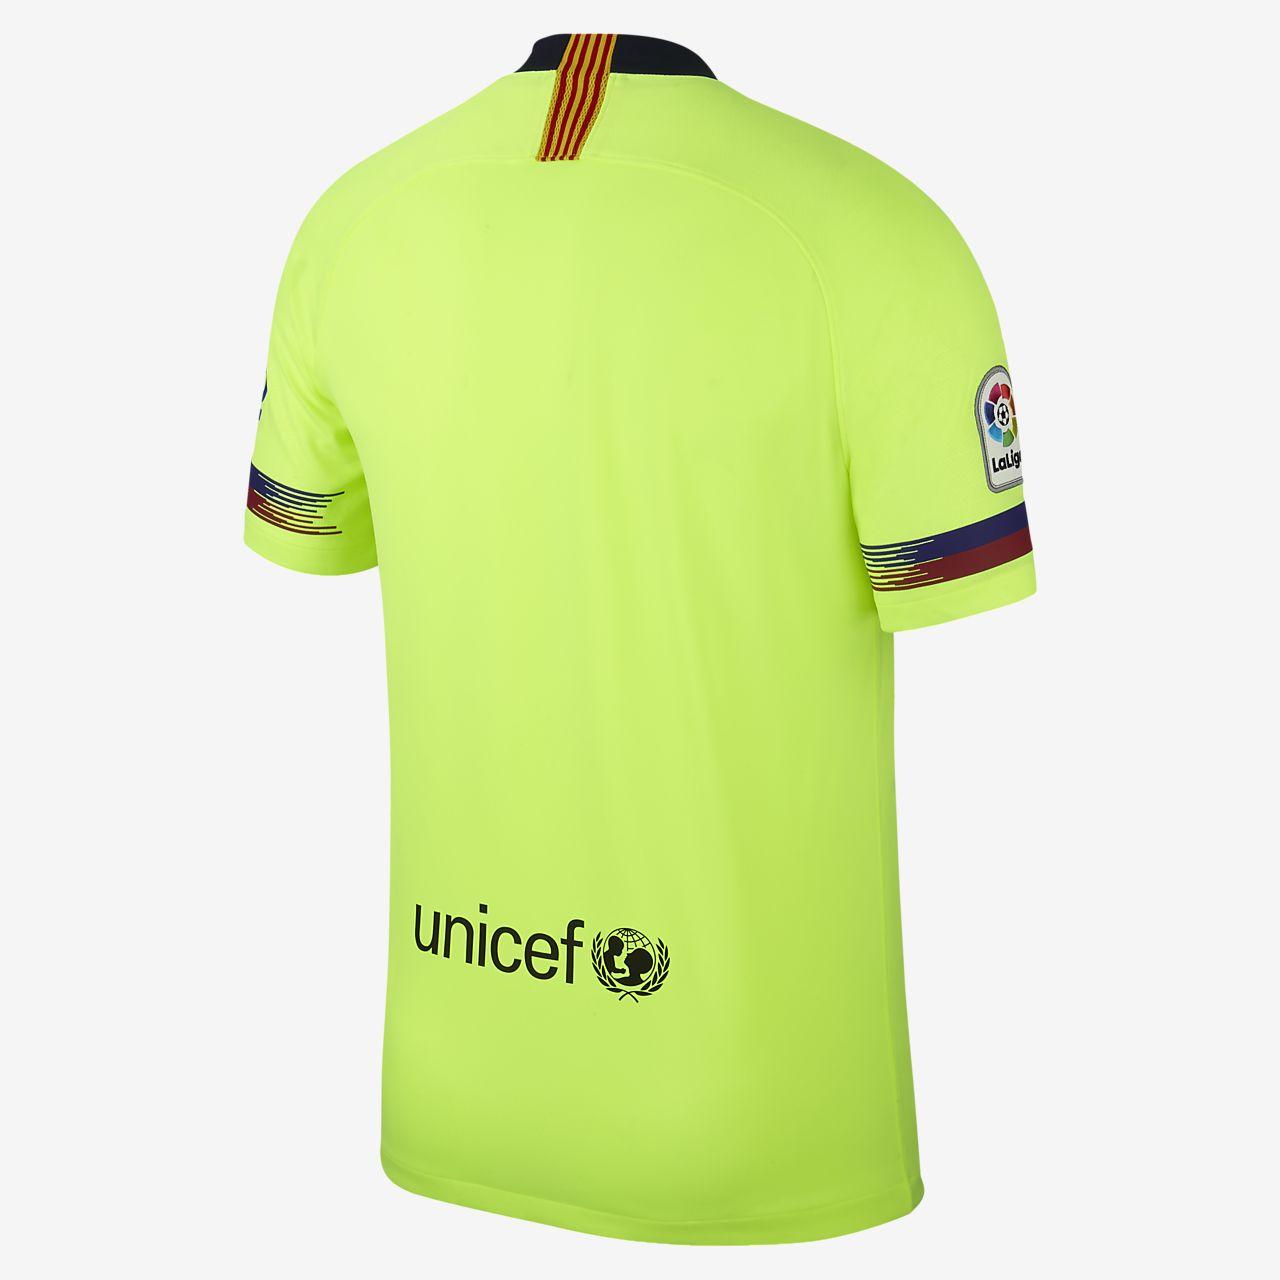 52c7ba8b66172 2018 19 FC Barcelona Stadium Away Men s Football Shirt. Nike.com AU